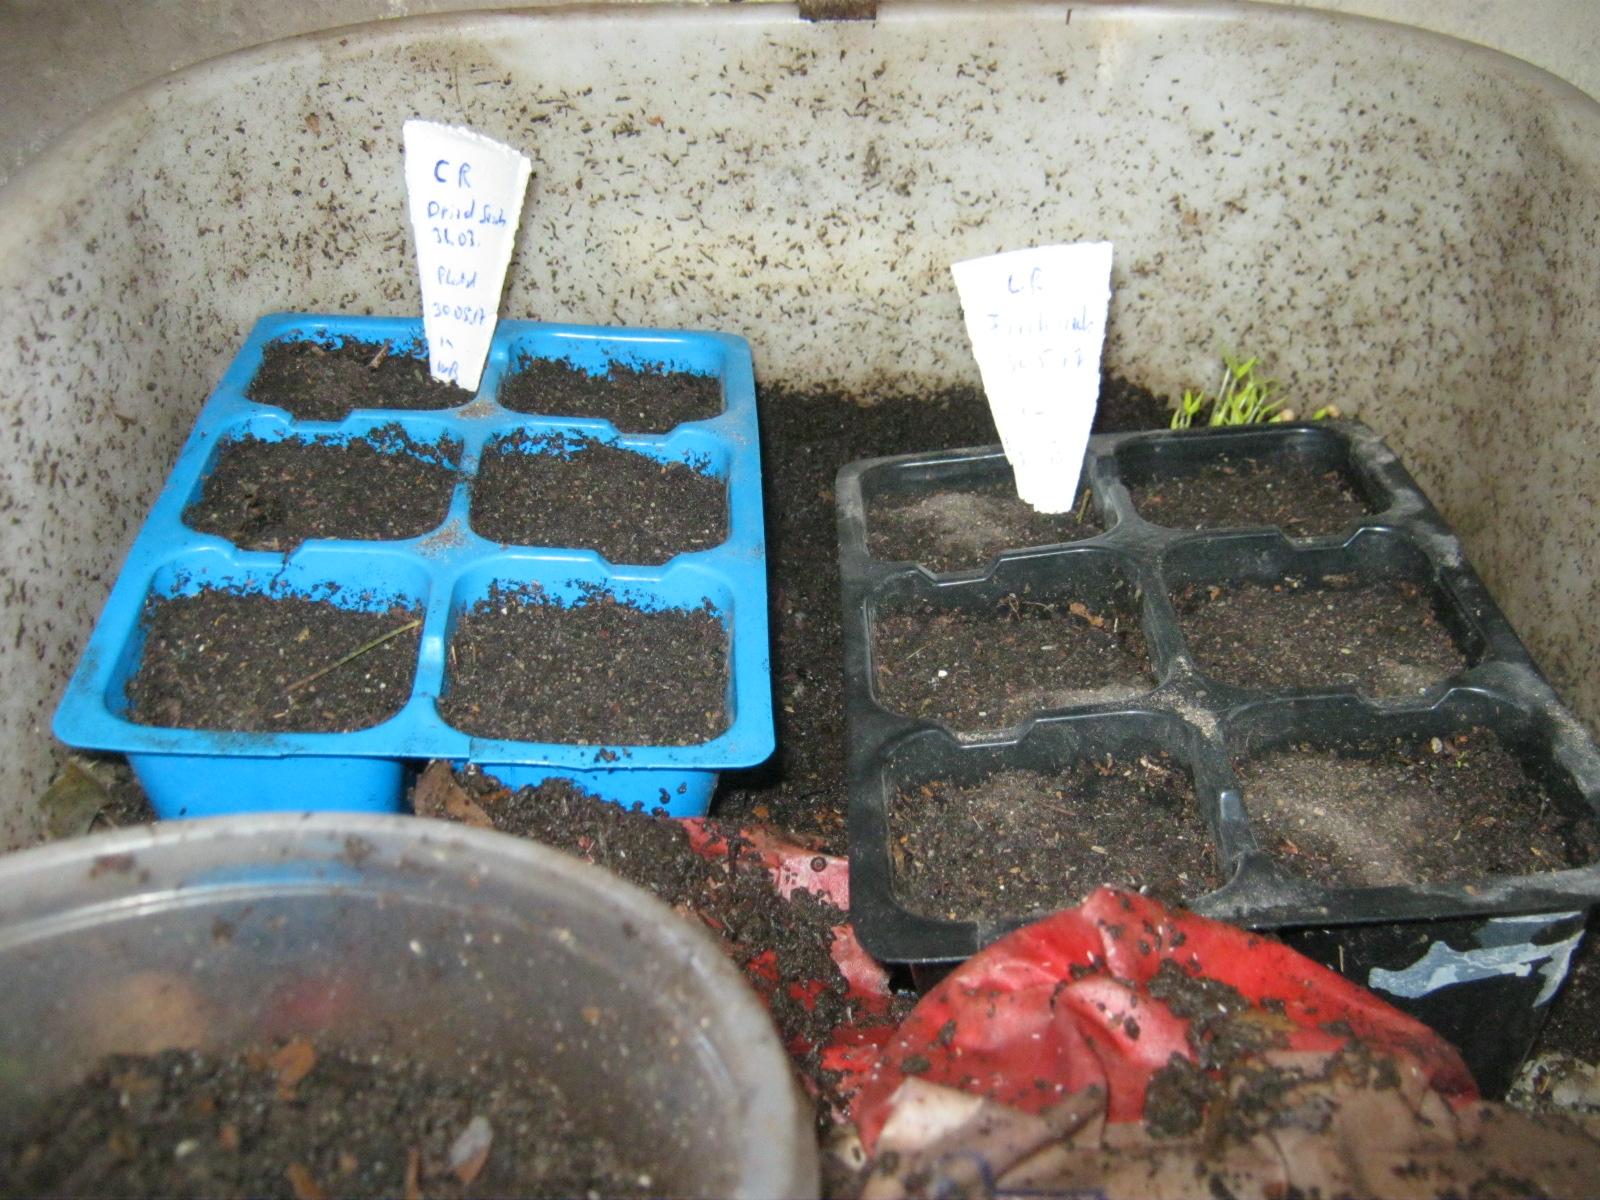 2 six packs with Carolina Reaper seeds in Worm bin